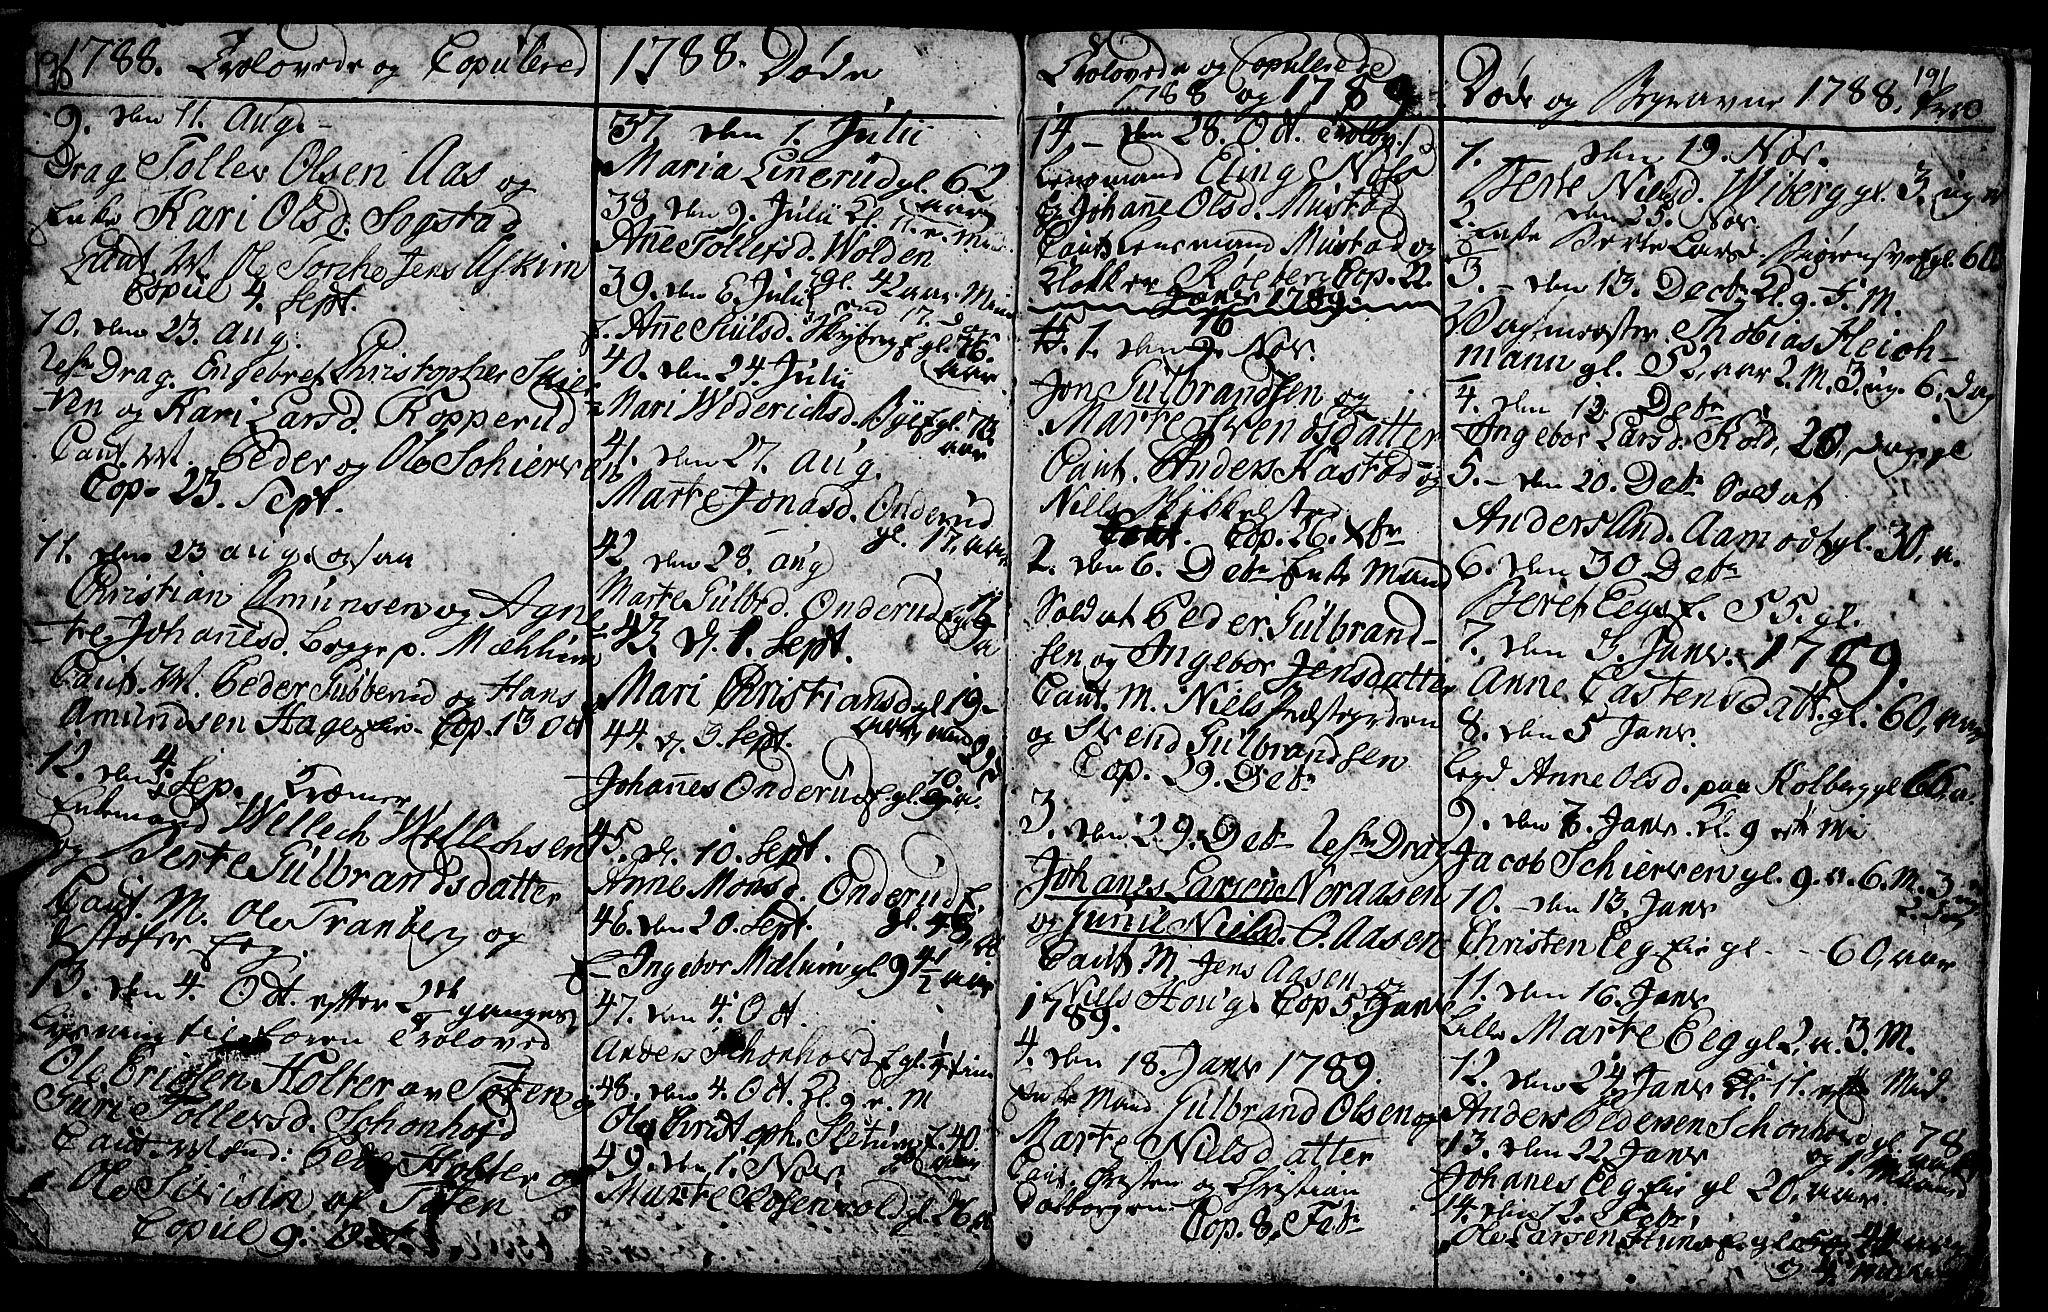 SAH, Vardal prestekontor, H/Ha/Hab/L0001: Klokkerbok nr. 1, 1771-1790, s. 190-191